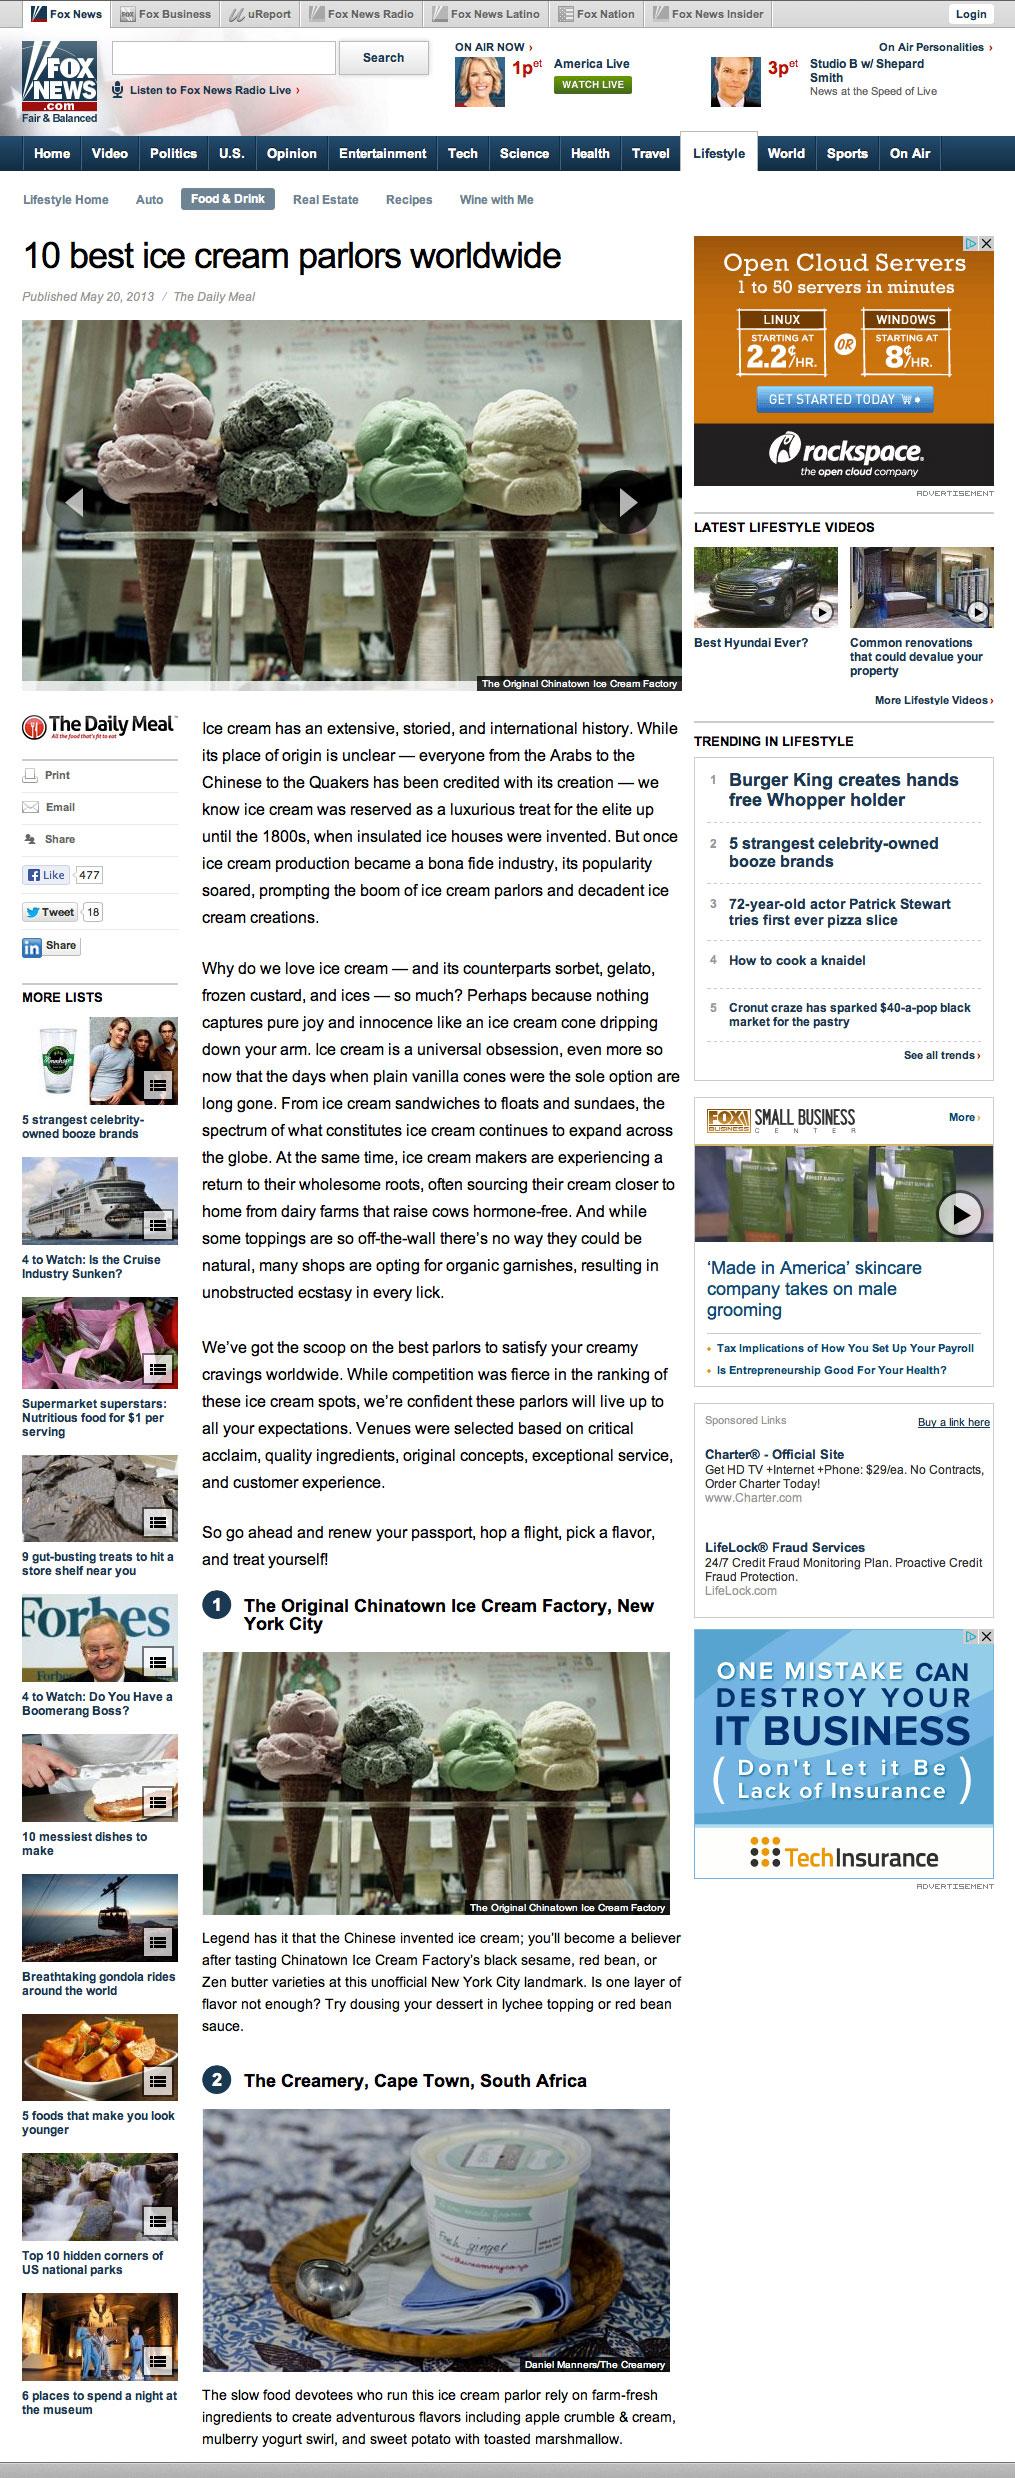 Press_2013-05-20-FoxNews.jpg